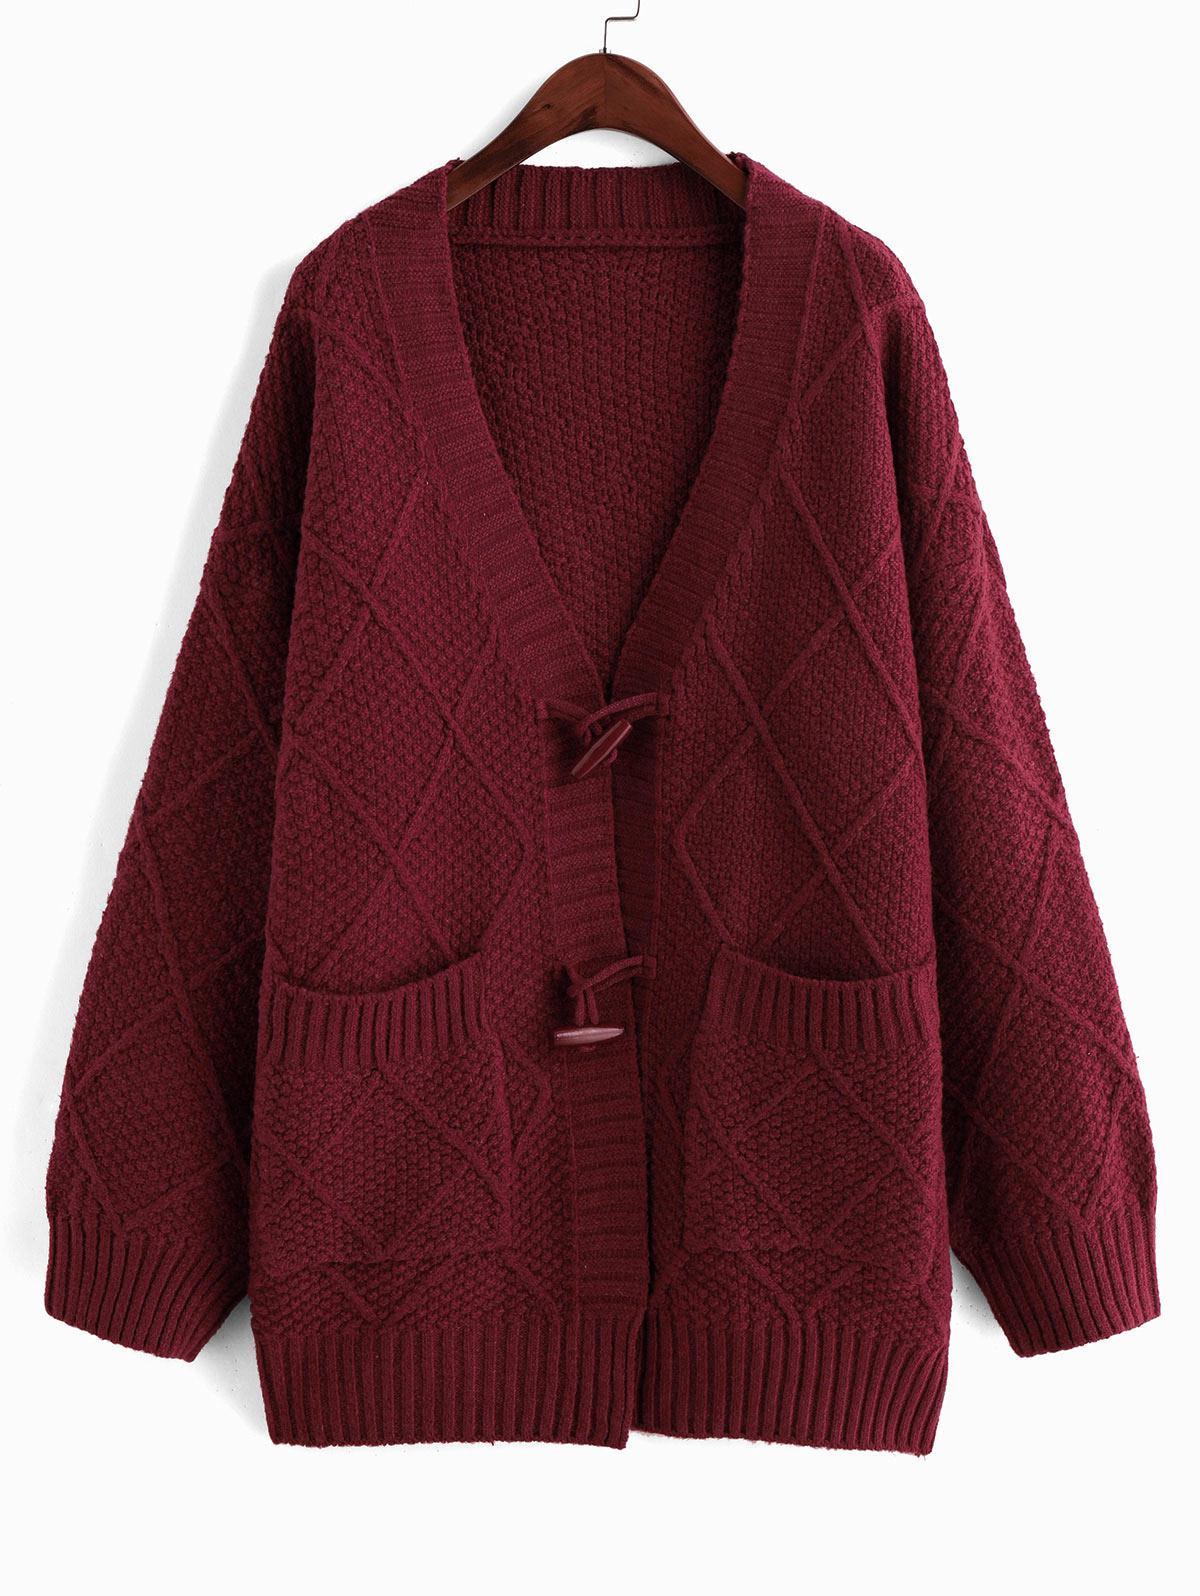 Christmas Horn Button Drop Shoulder Pocket Tunic Cardigan